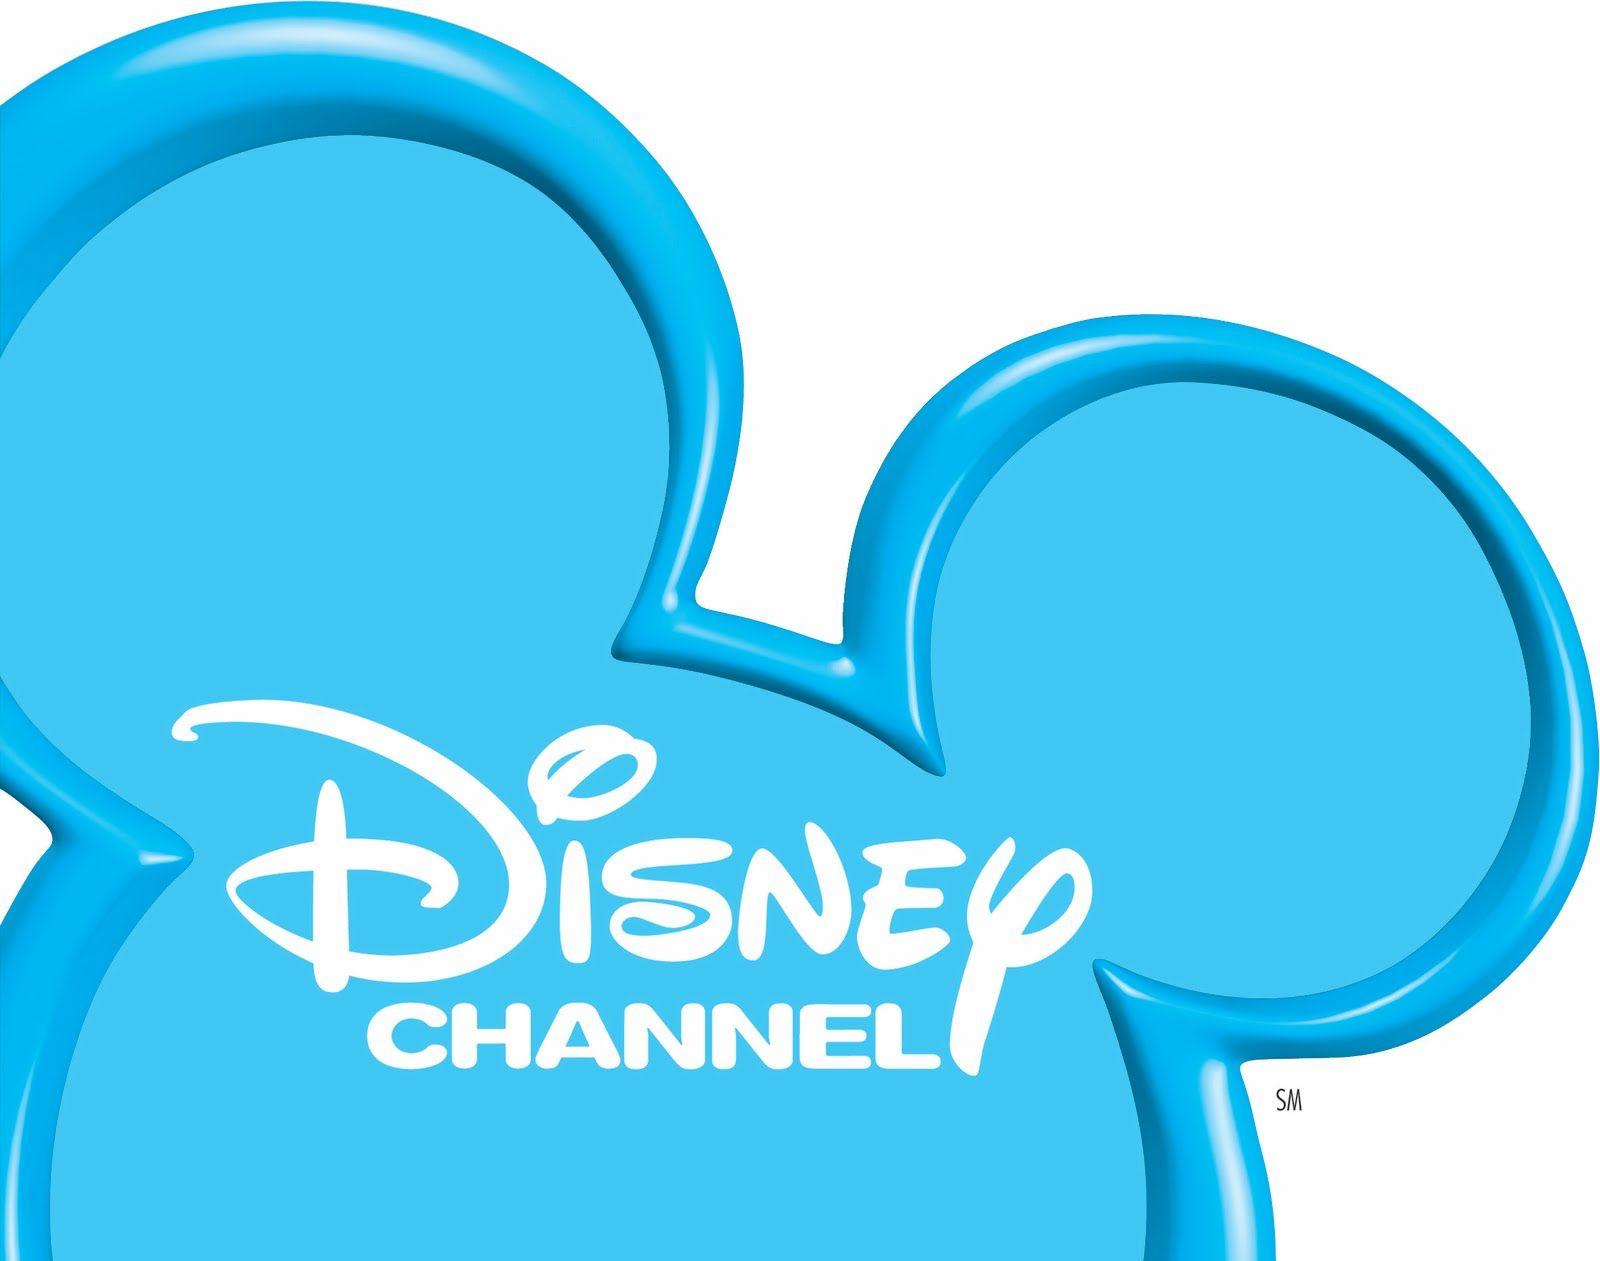 Explore And Share Disney Logo Wallpaper Disney Logo 608 Hd Wallpapers In Logos Imagesci Com Disney Channel Logo Disney Channel Disney Channel Shows